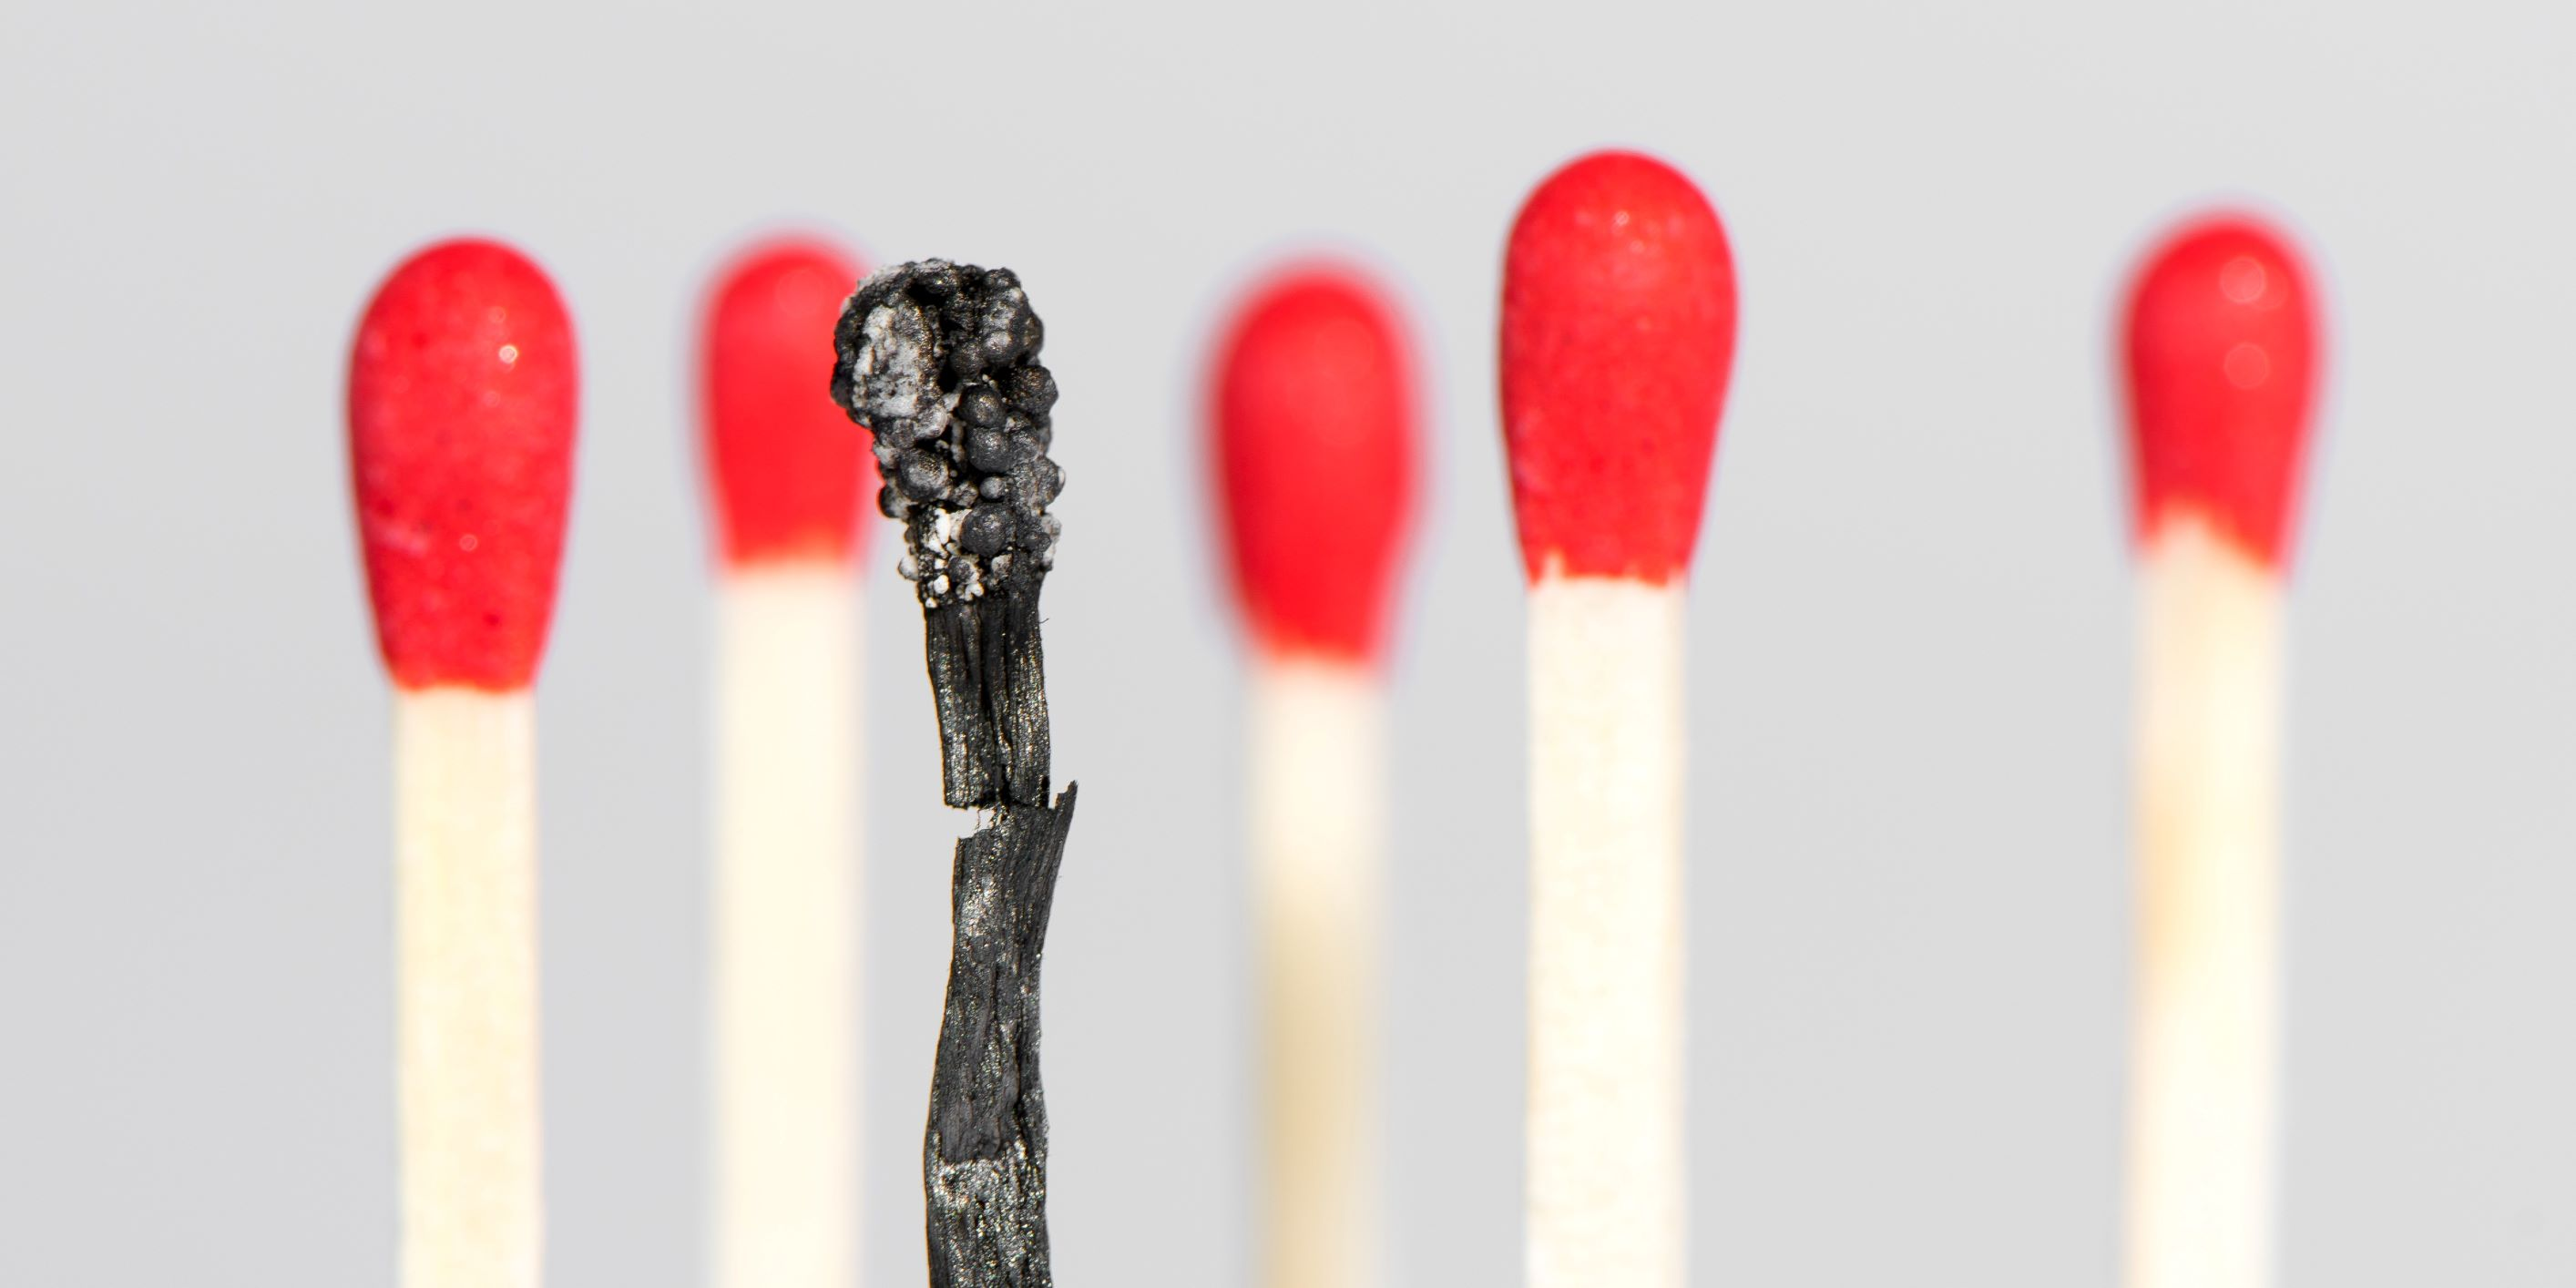 fundraising burnout